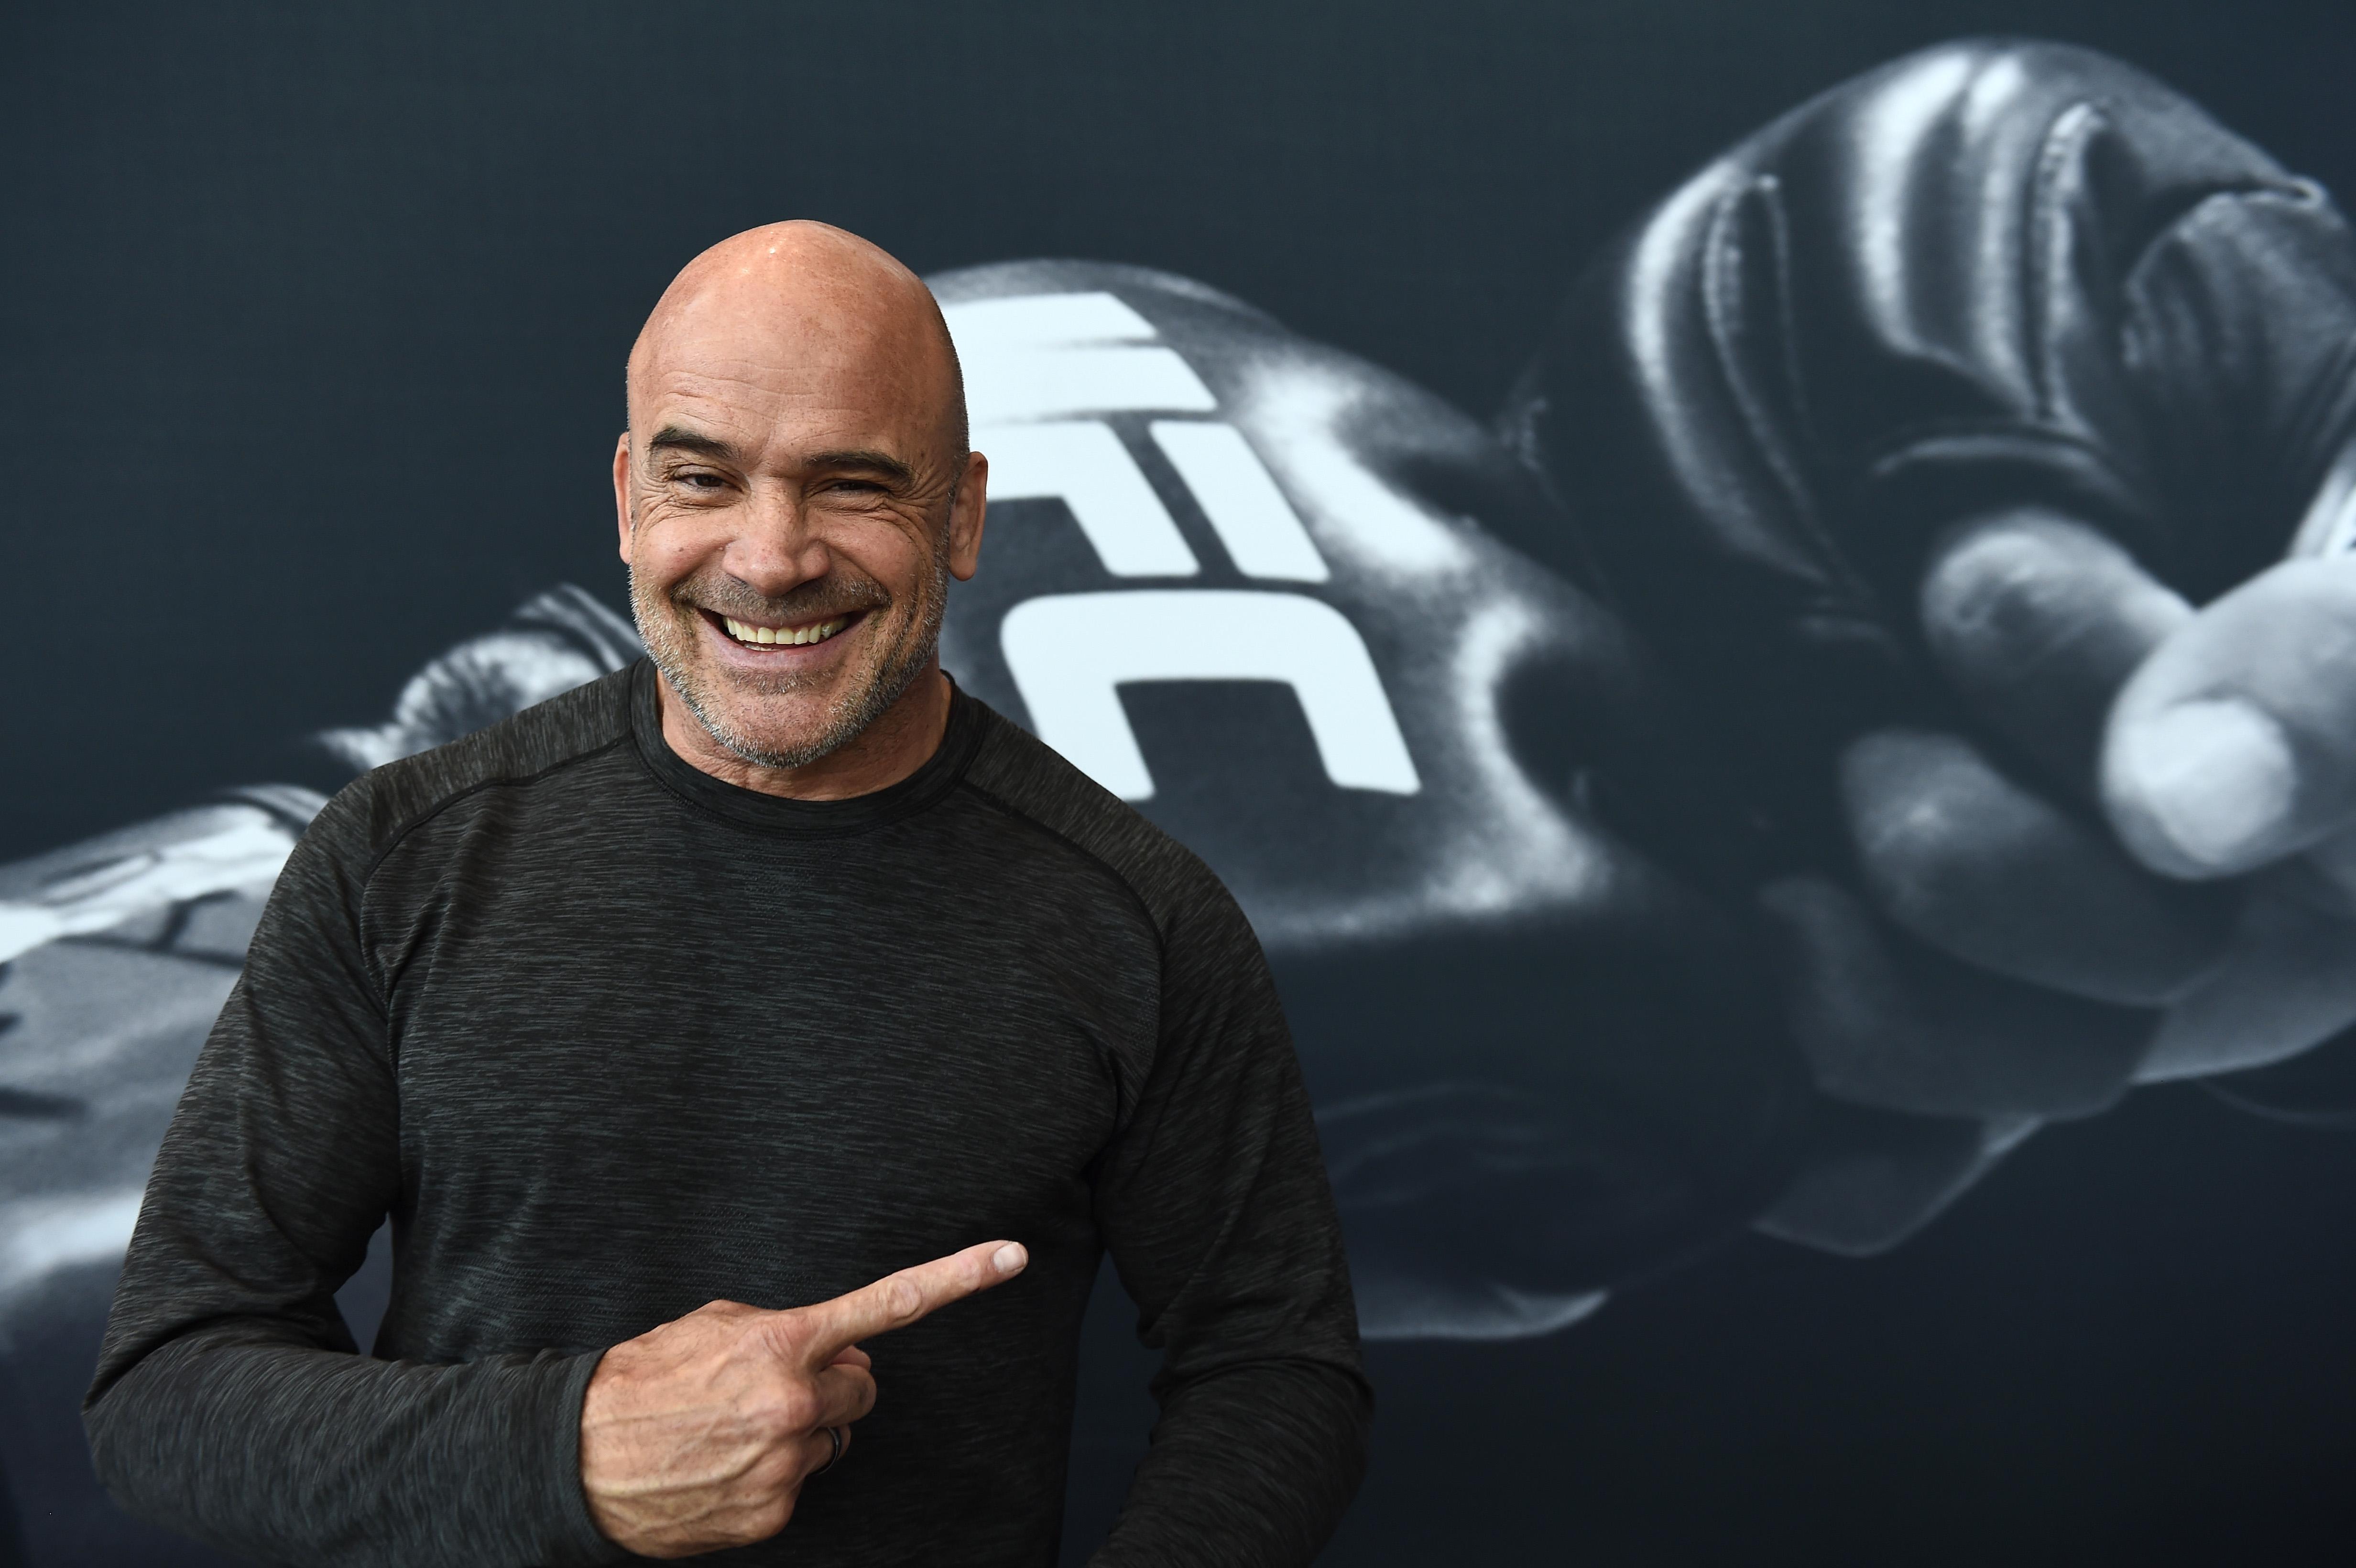 Bas Rutten attends a UFC fan event in 2017.